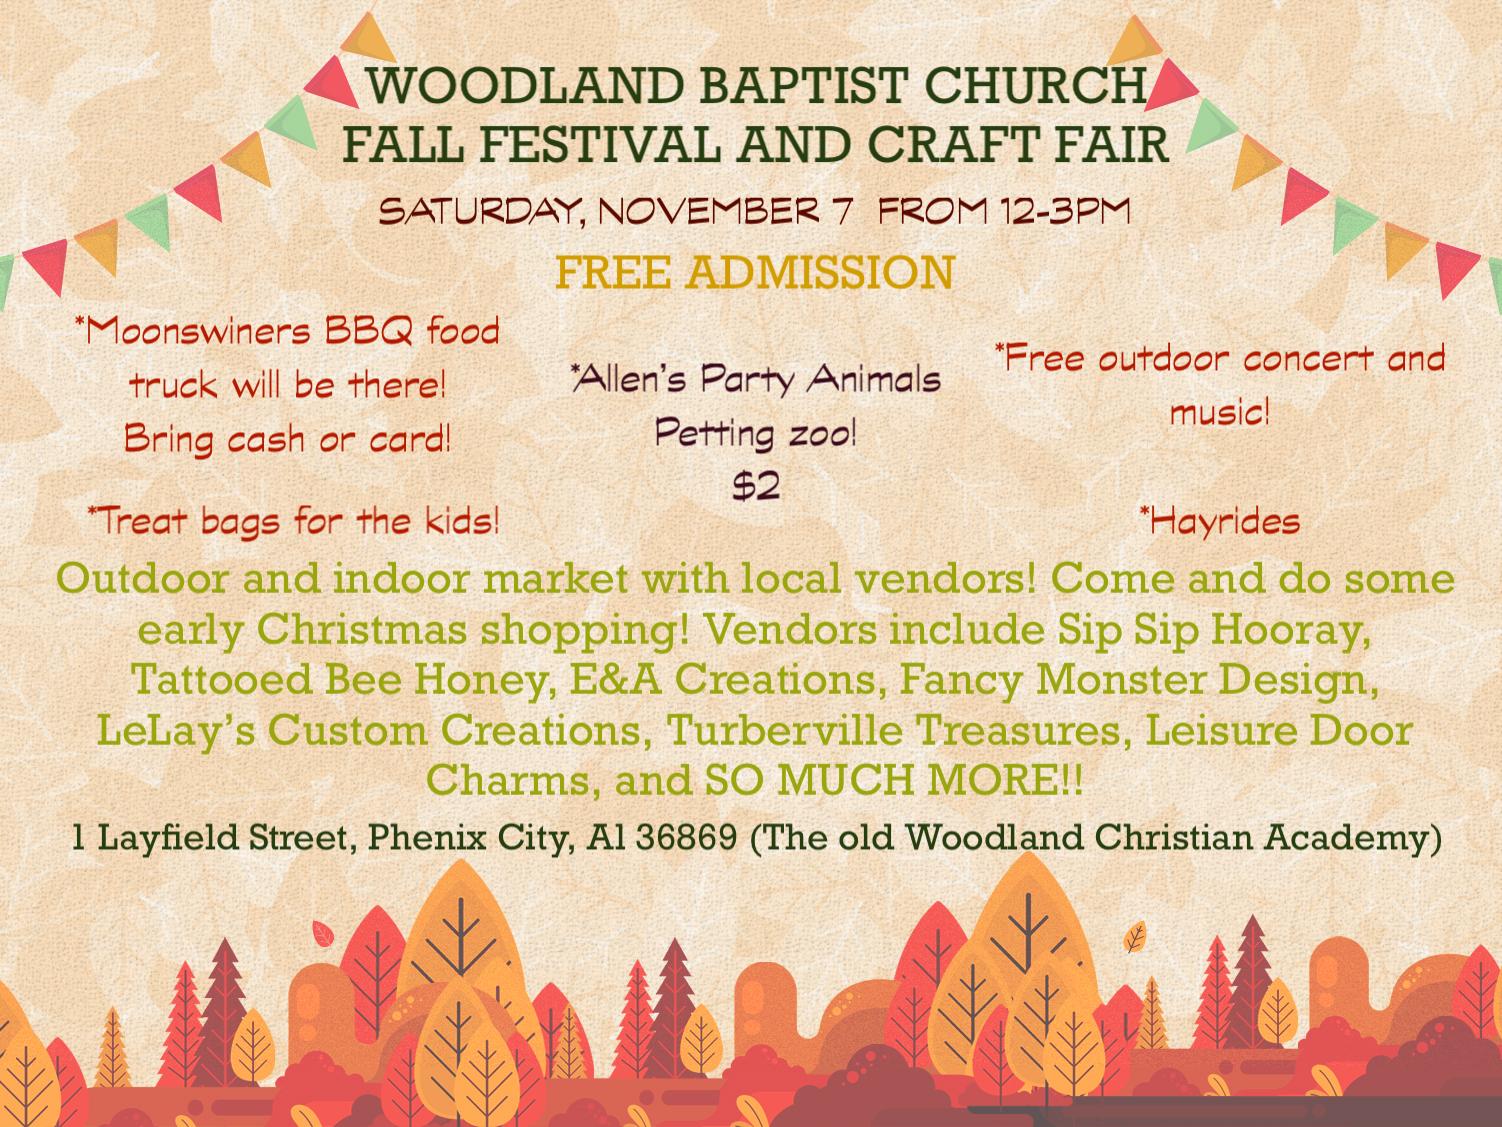 Fall Festival & Craft Fair